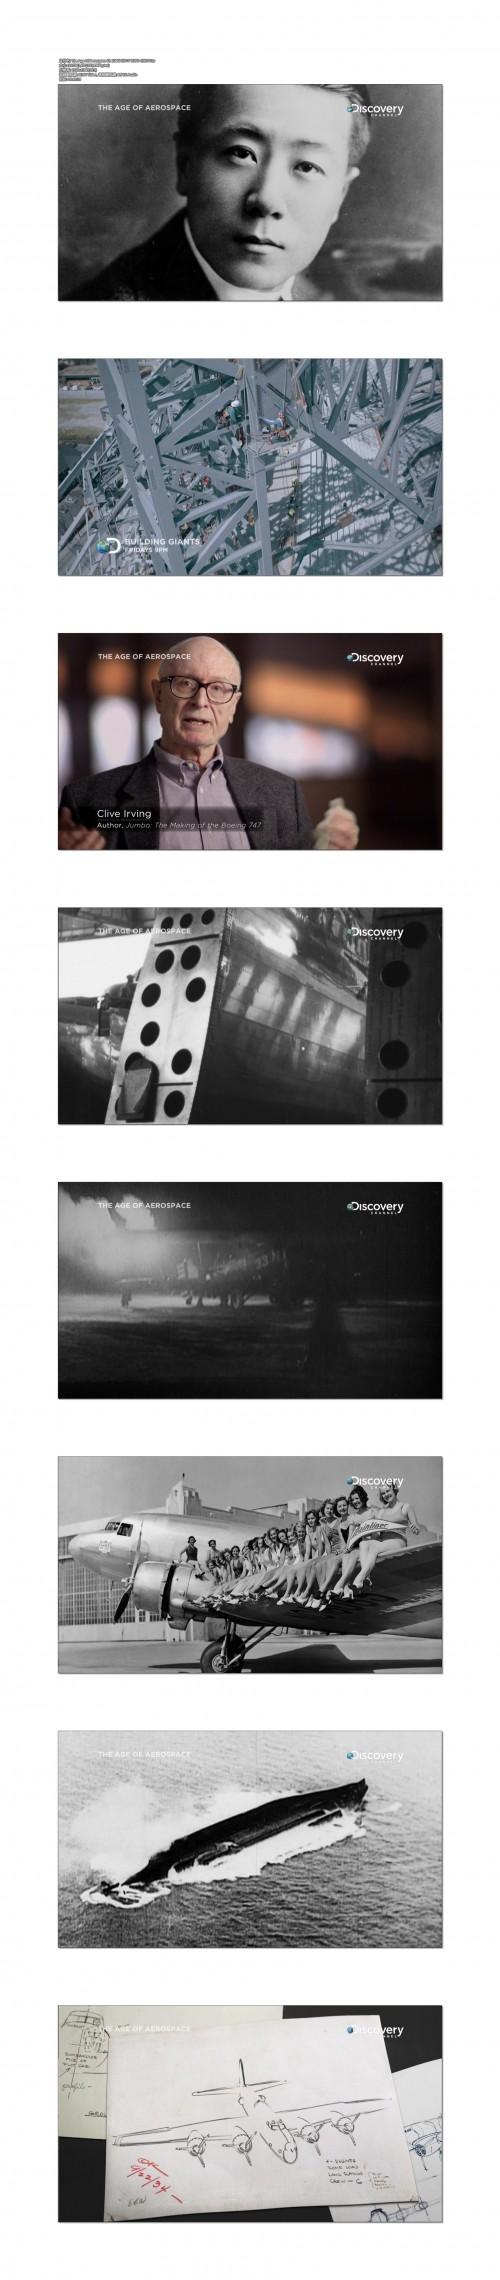 The-Age-Of-Aerospace-E1-1080i-HDTV-H264-CHDTV.jpg